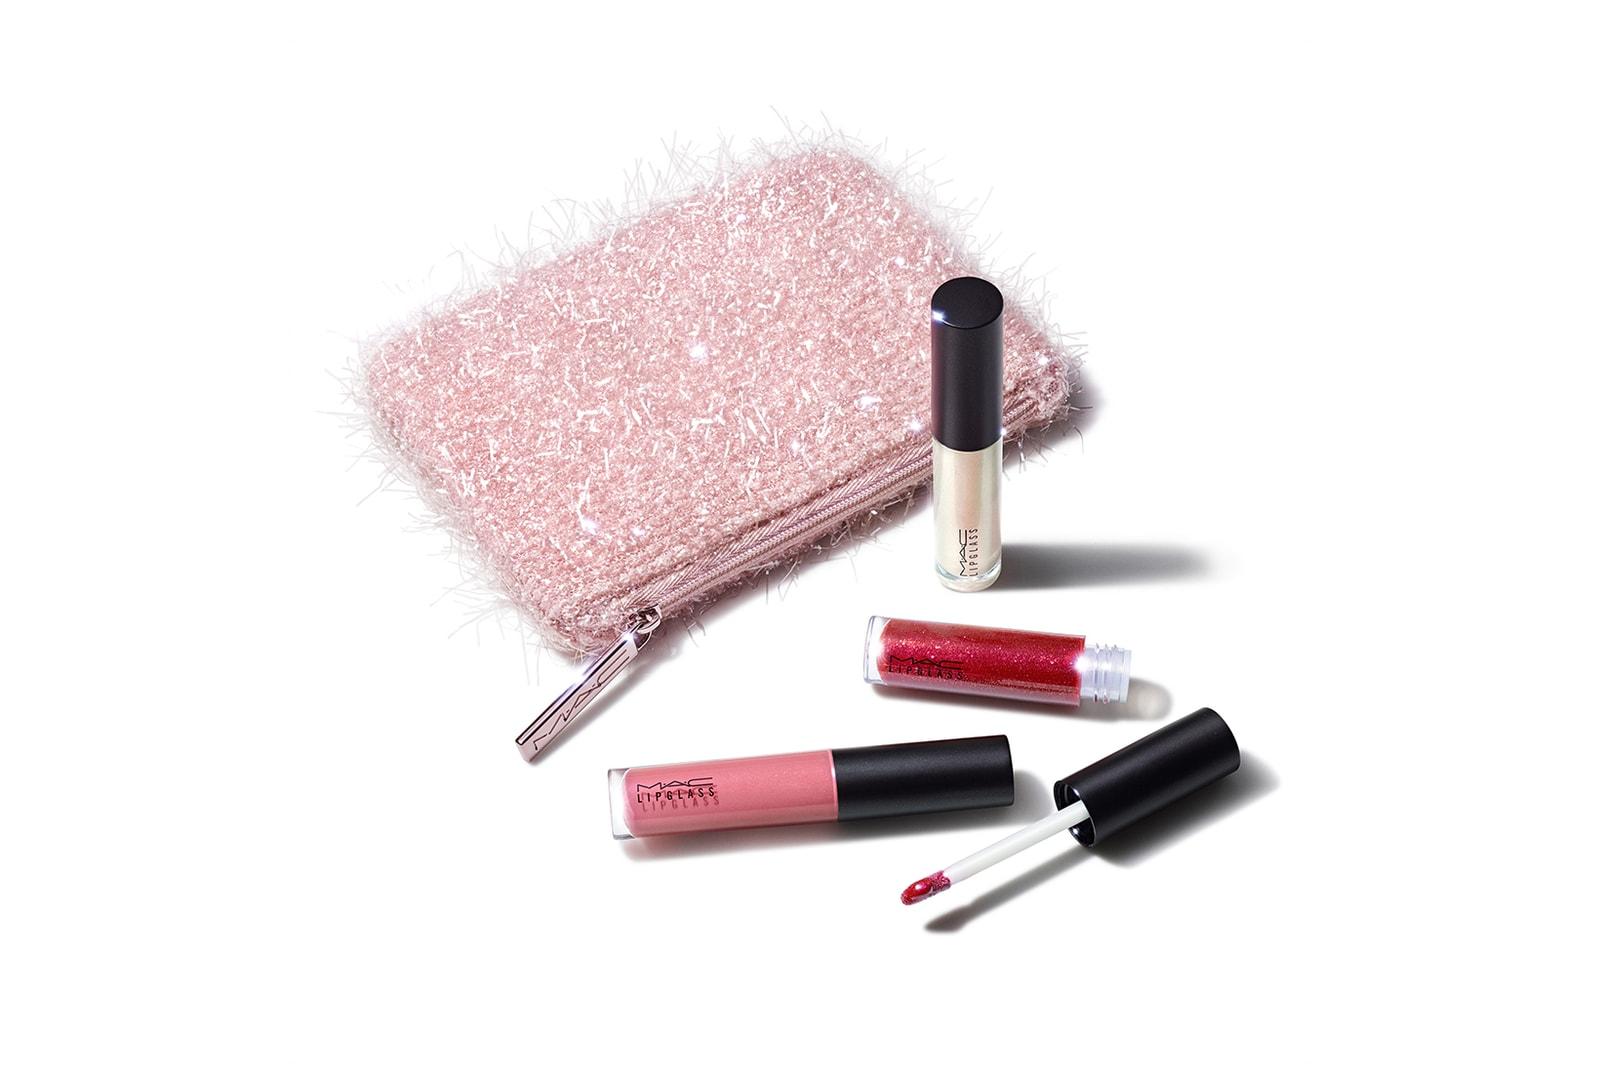 mac frosted firework holiday collection bretman rock loren gray karen sarahi gonzalez campaign makeup lipsticks